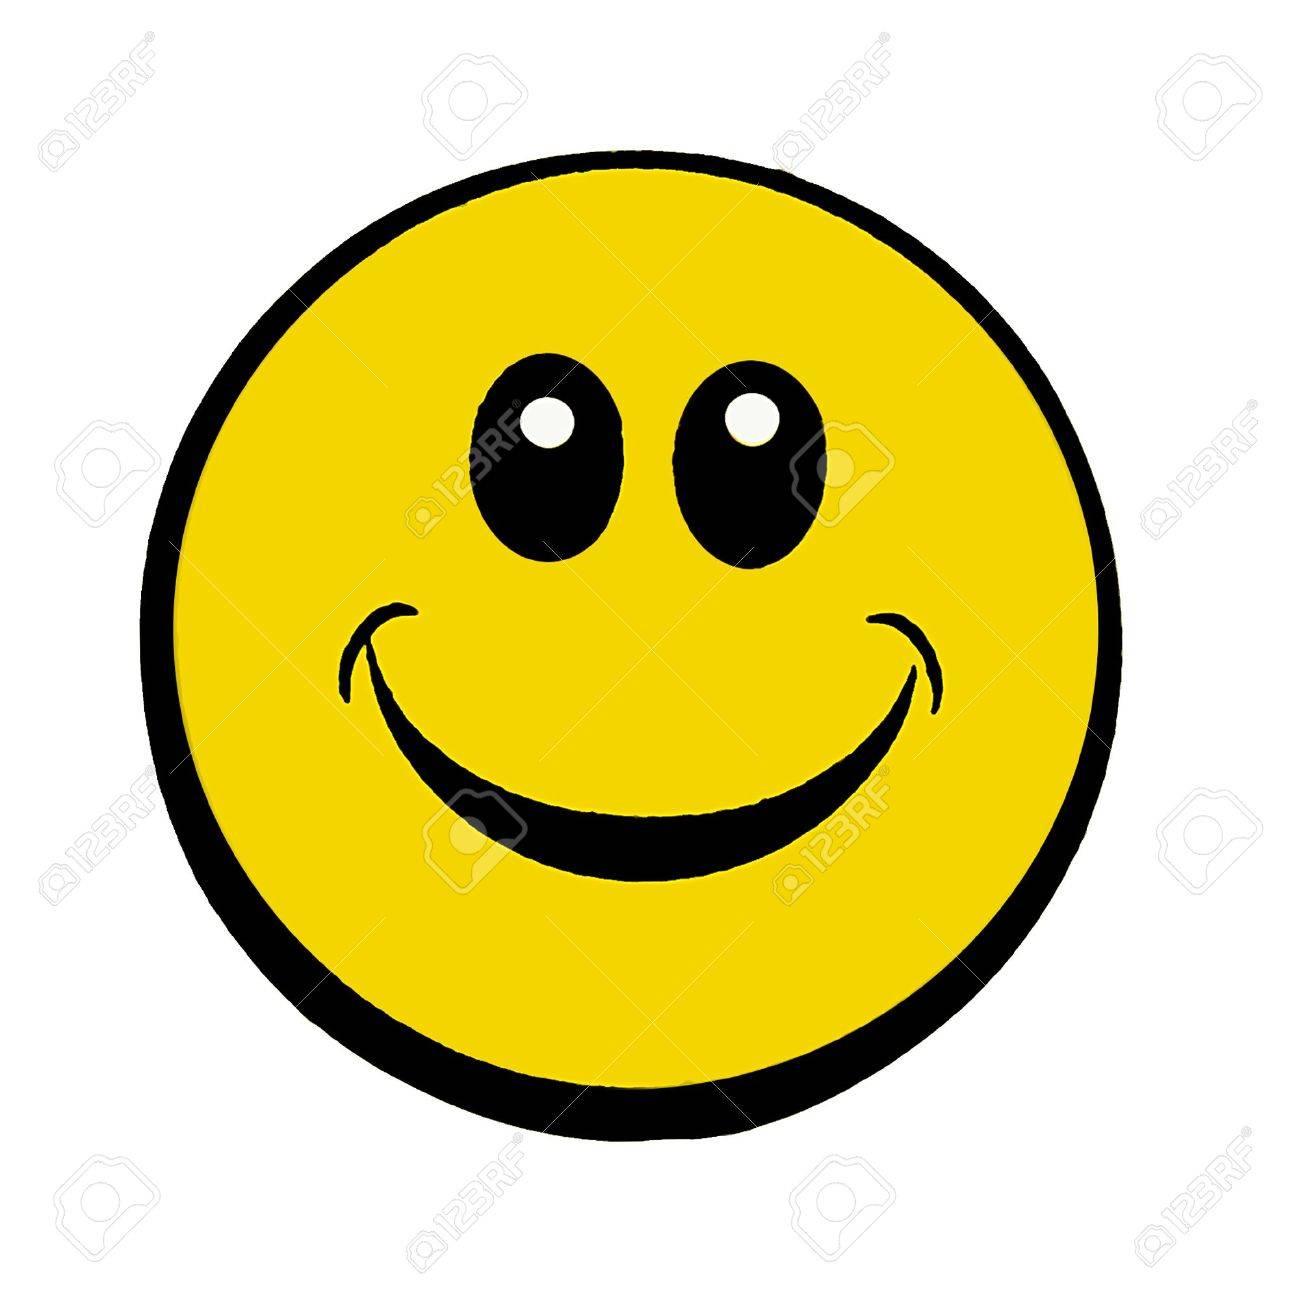 happy smiley face Stock Photo - 6848956